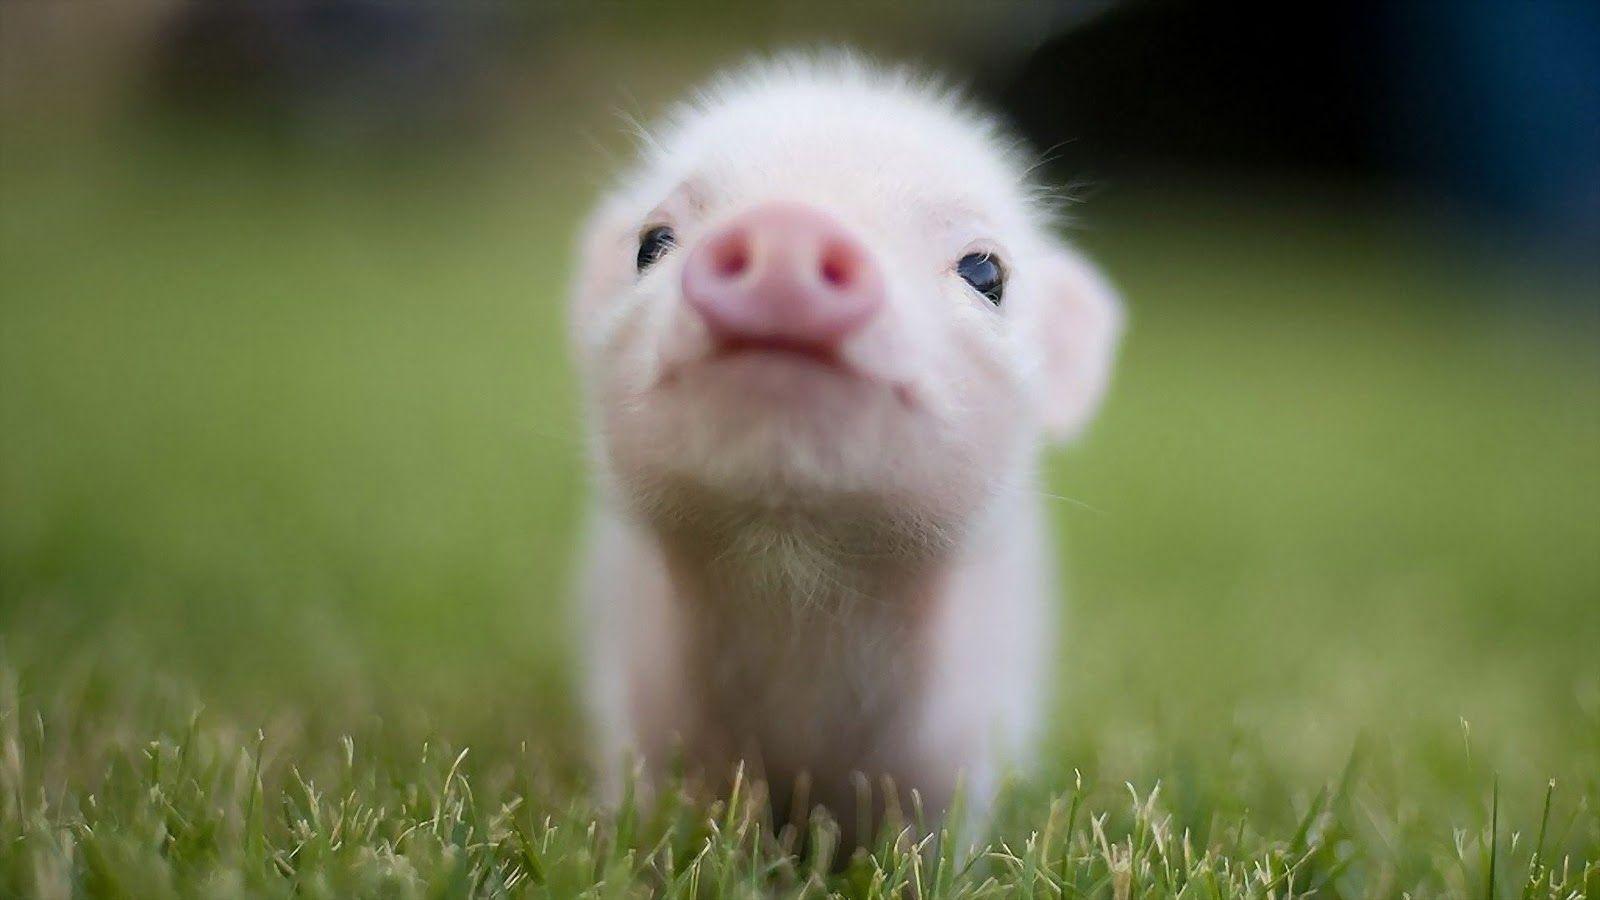 Cute Pig Wallpapers 1600x900